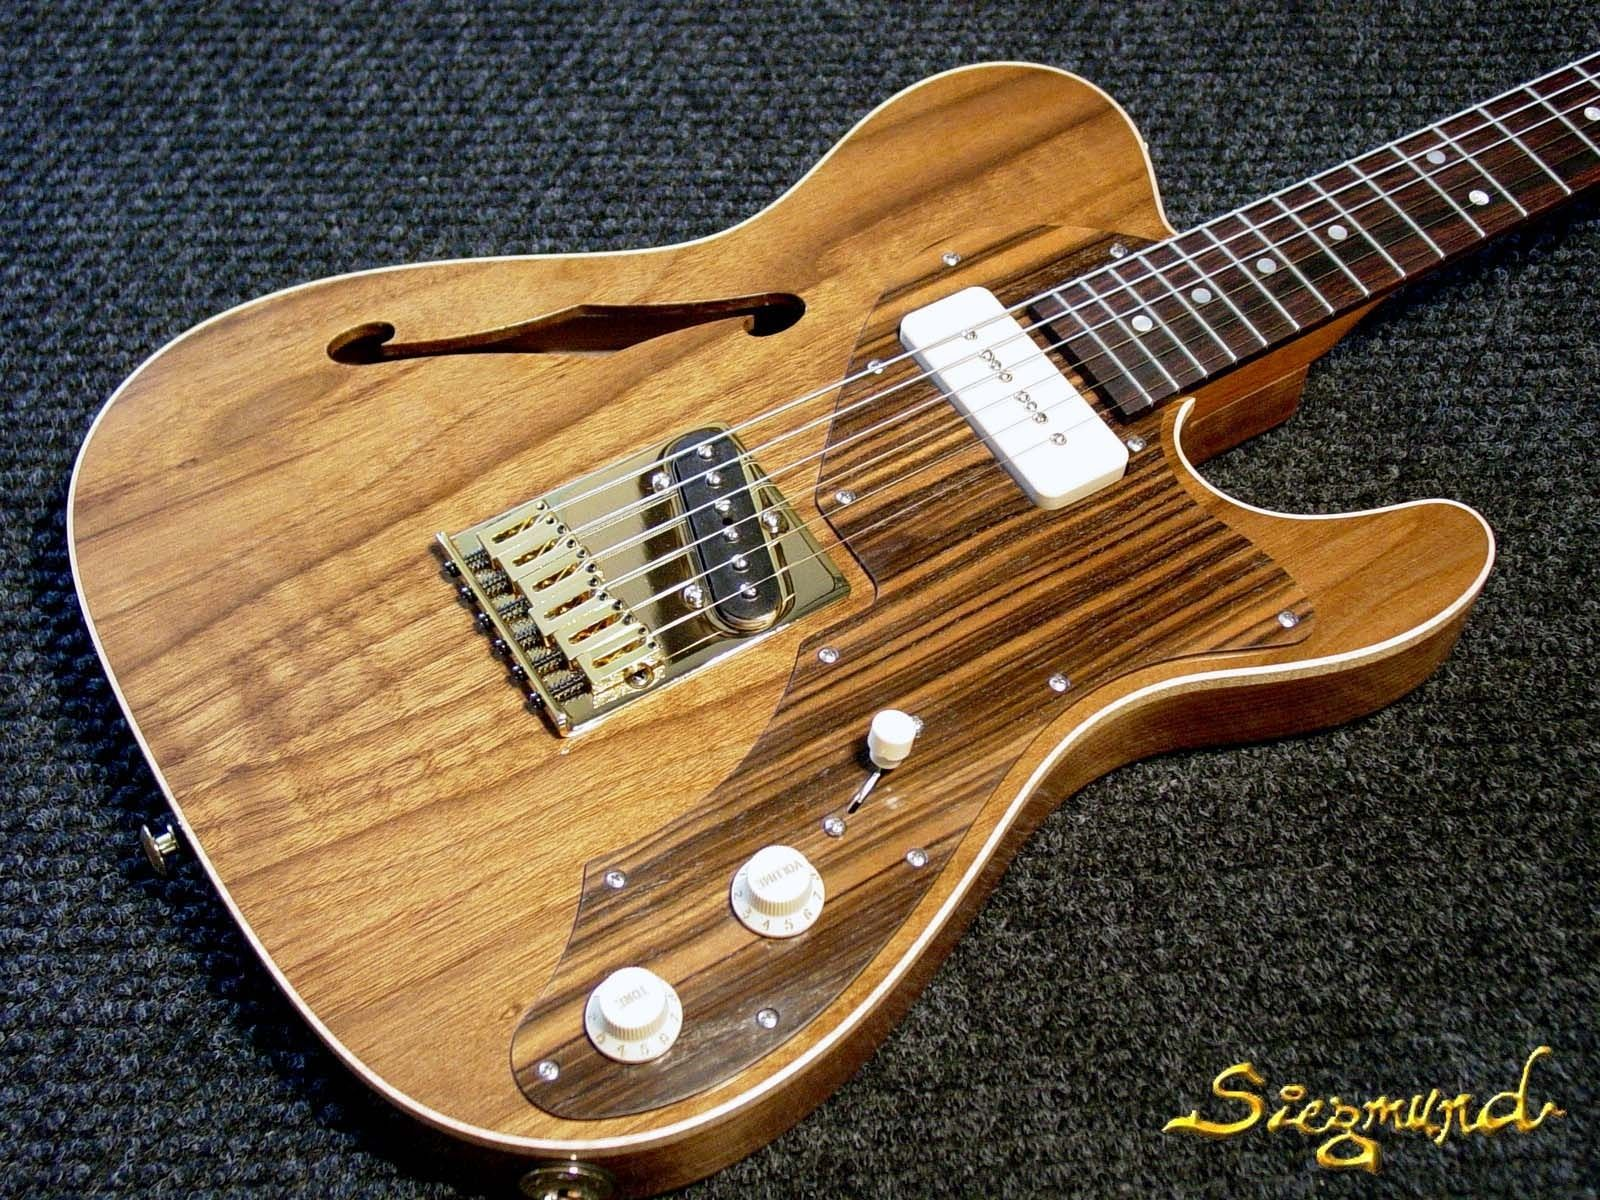 custom outcaster guitar by siegmund guitars amplifiers. Black Bedroom Furniture Sets. Home Design Ideas